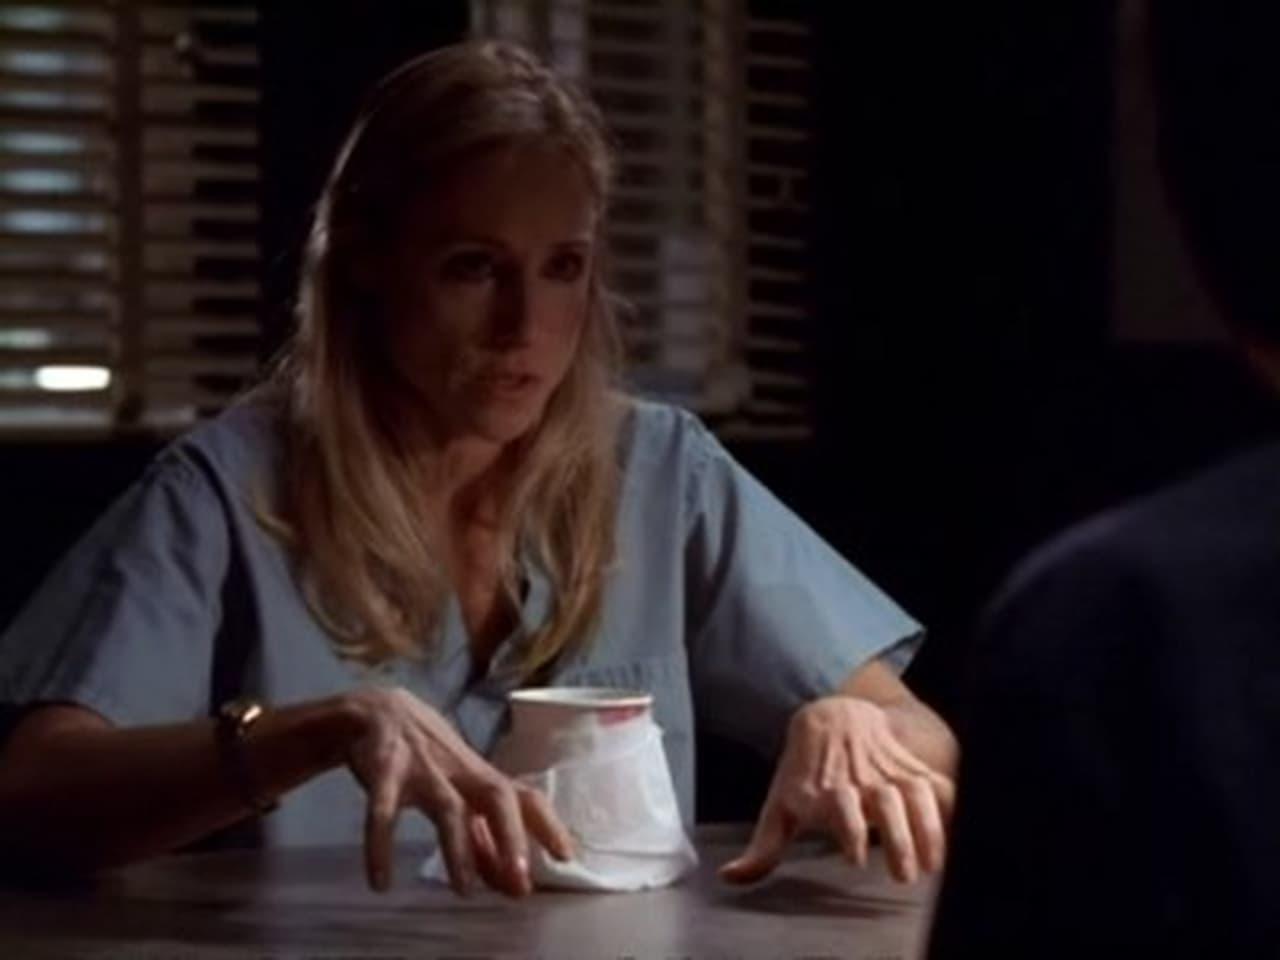 Law & Order: Special Victims Unit - Season 1 Episode 10 : Closure (Part I)